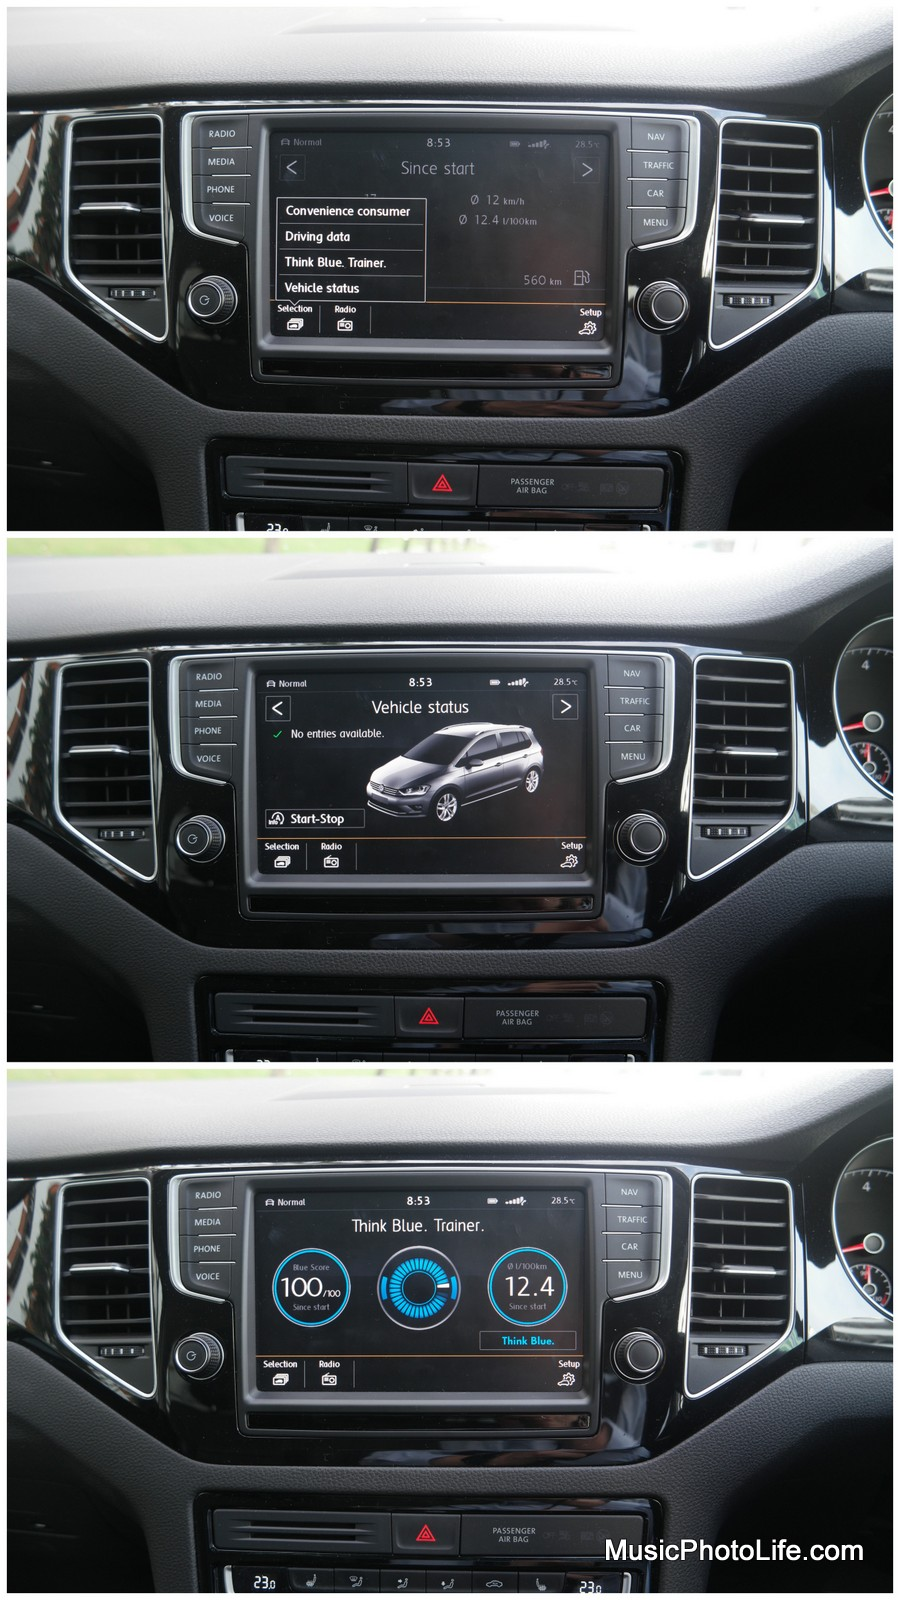 VW Sportsvan Infotainment System Car Menu